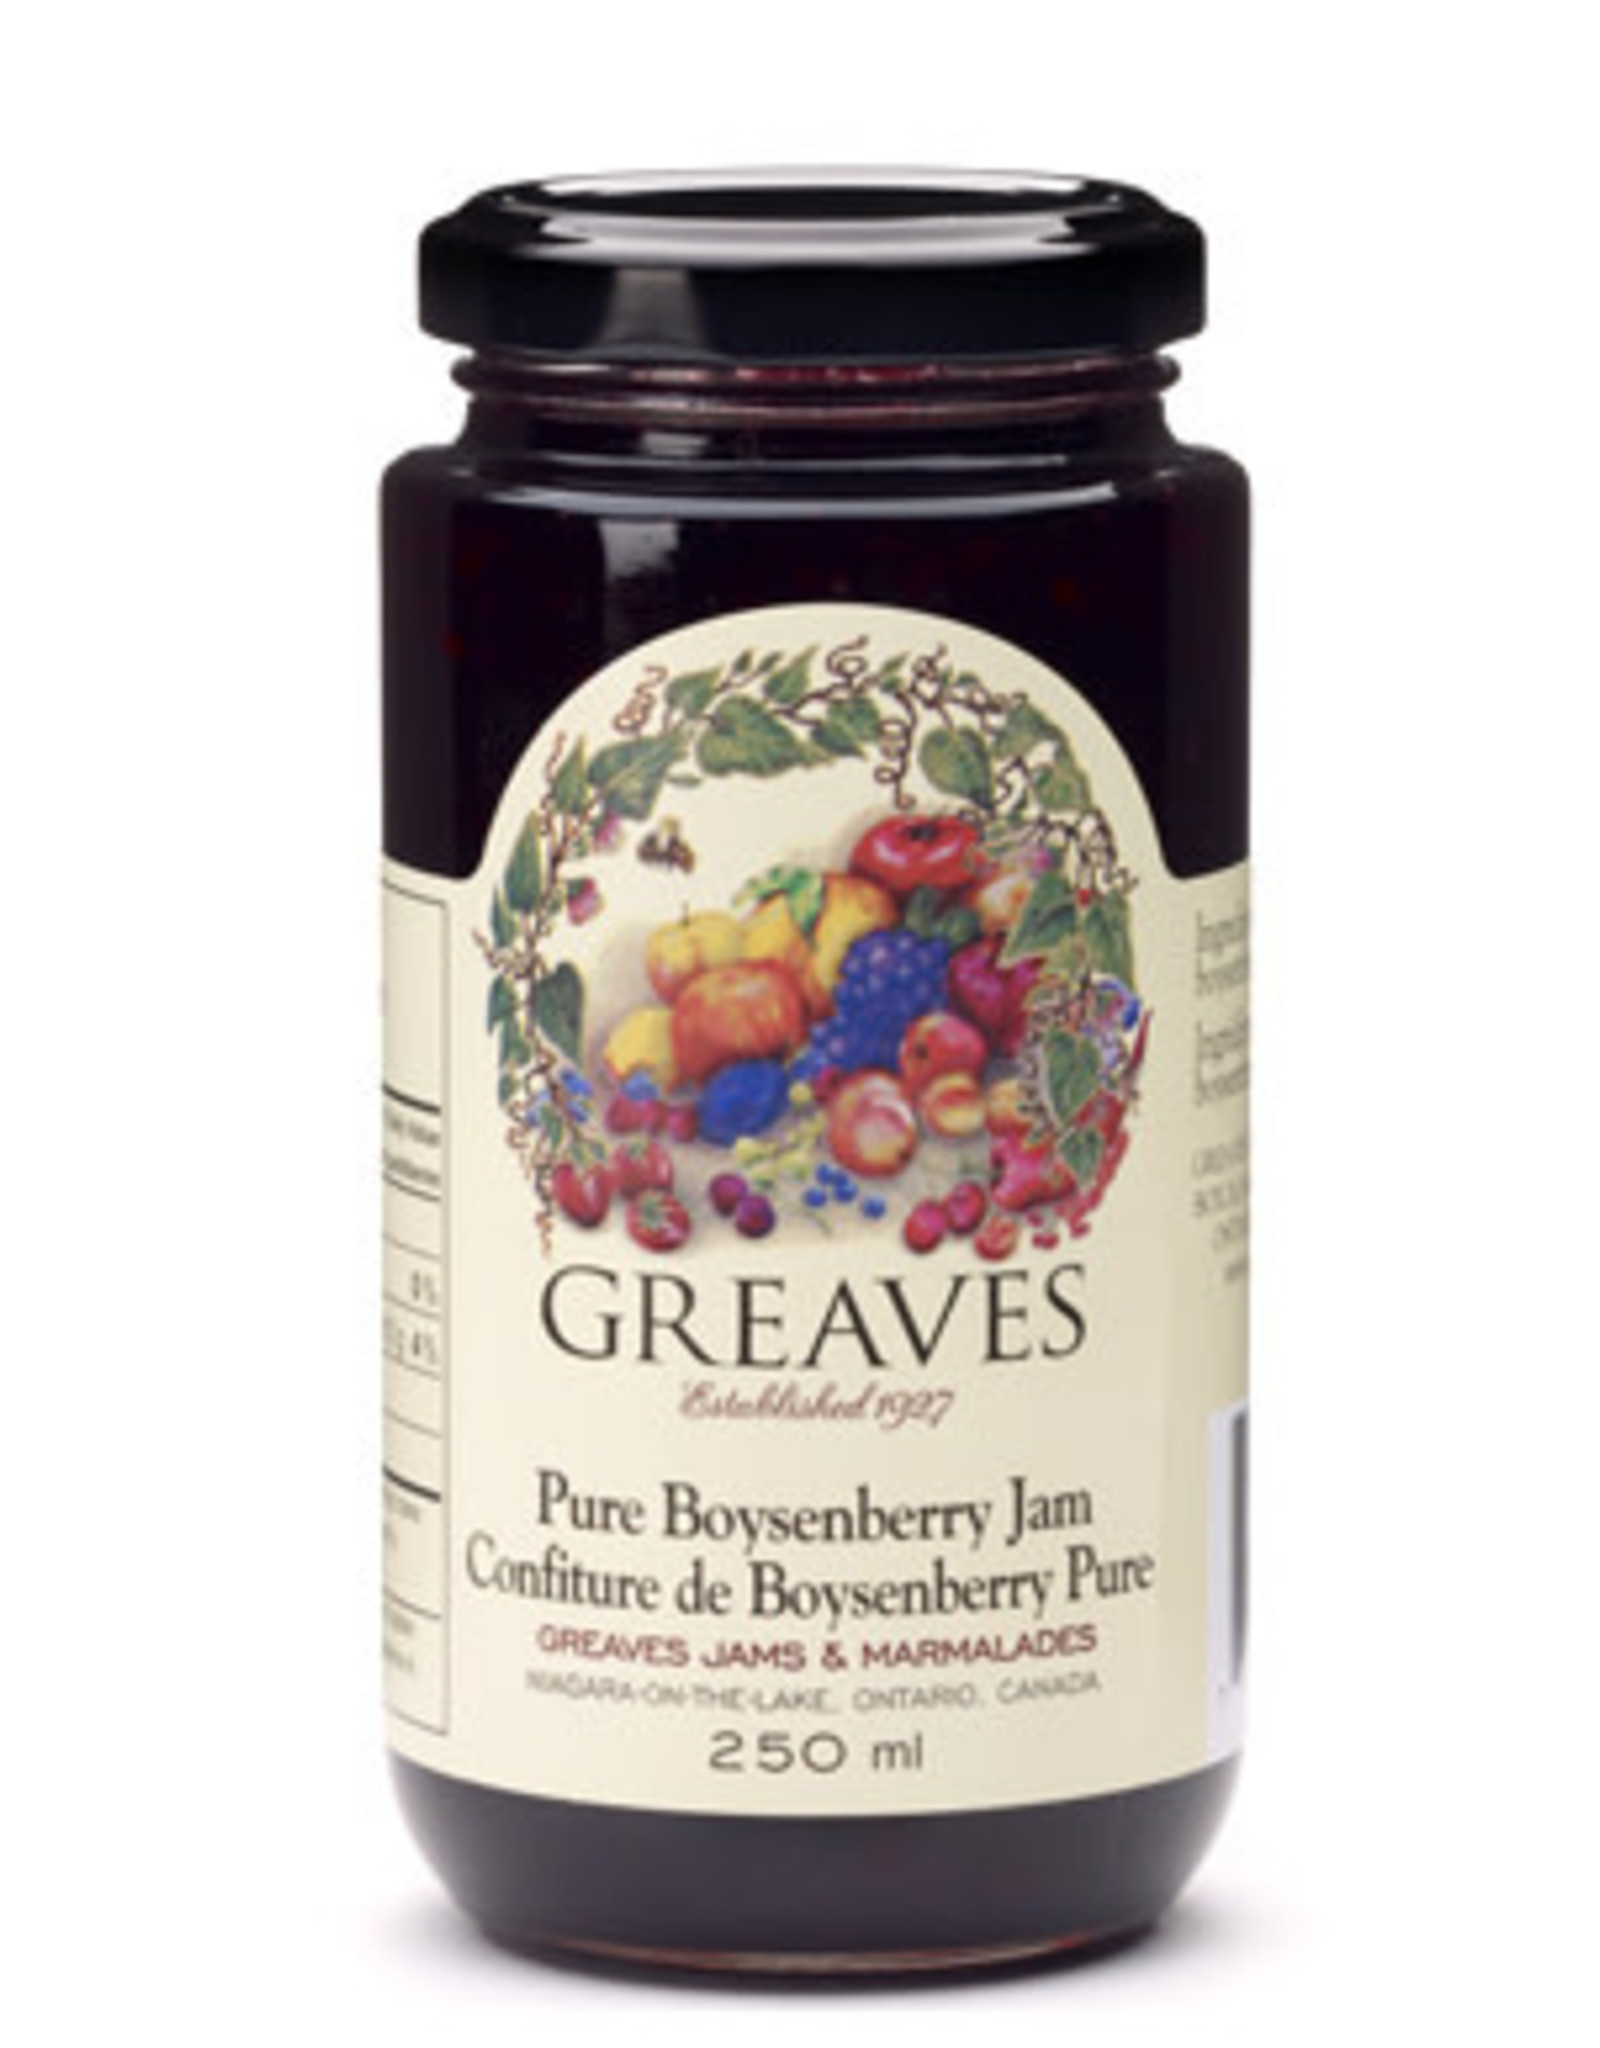 Greaves Jams & Marmalades Ltd. Greaves, Boysenberry Jam, 250ml